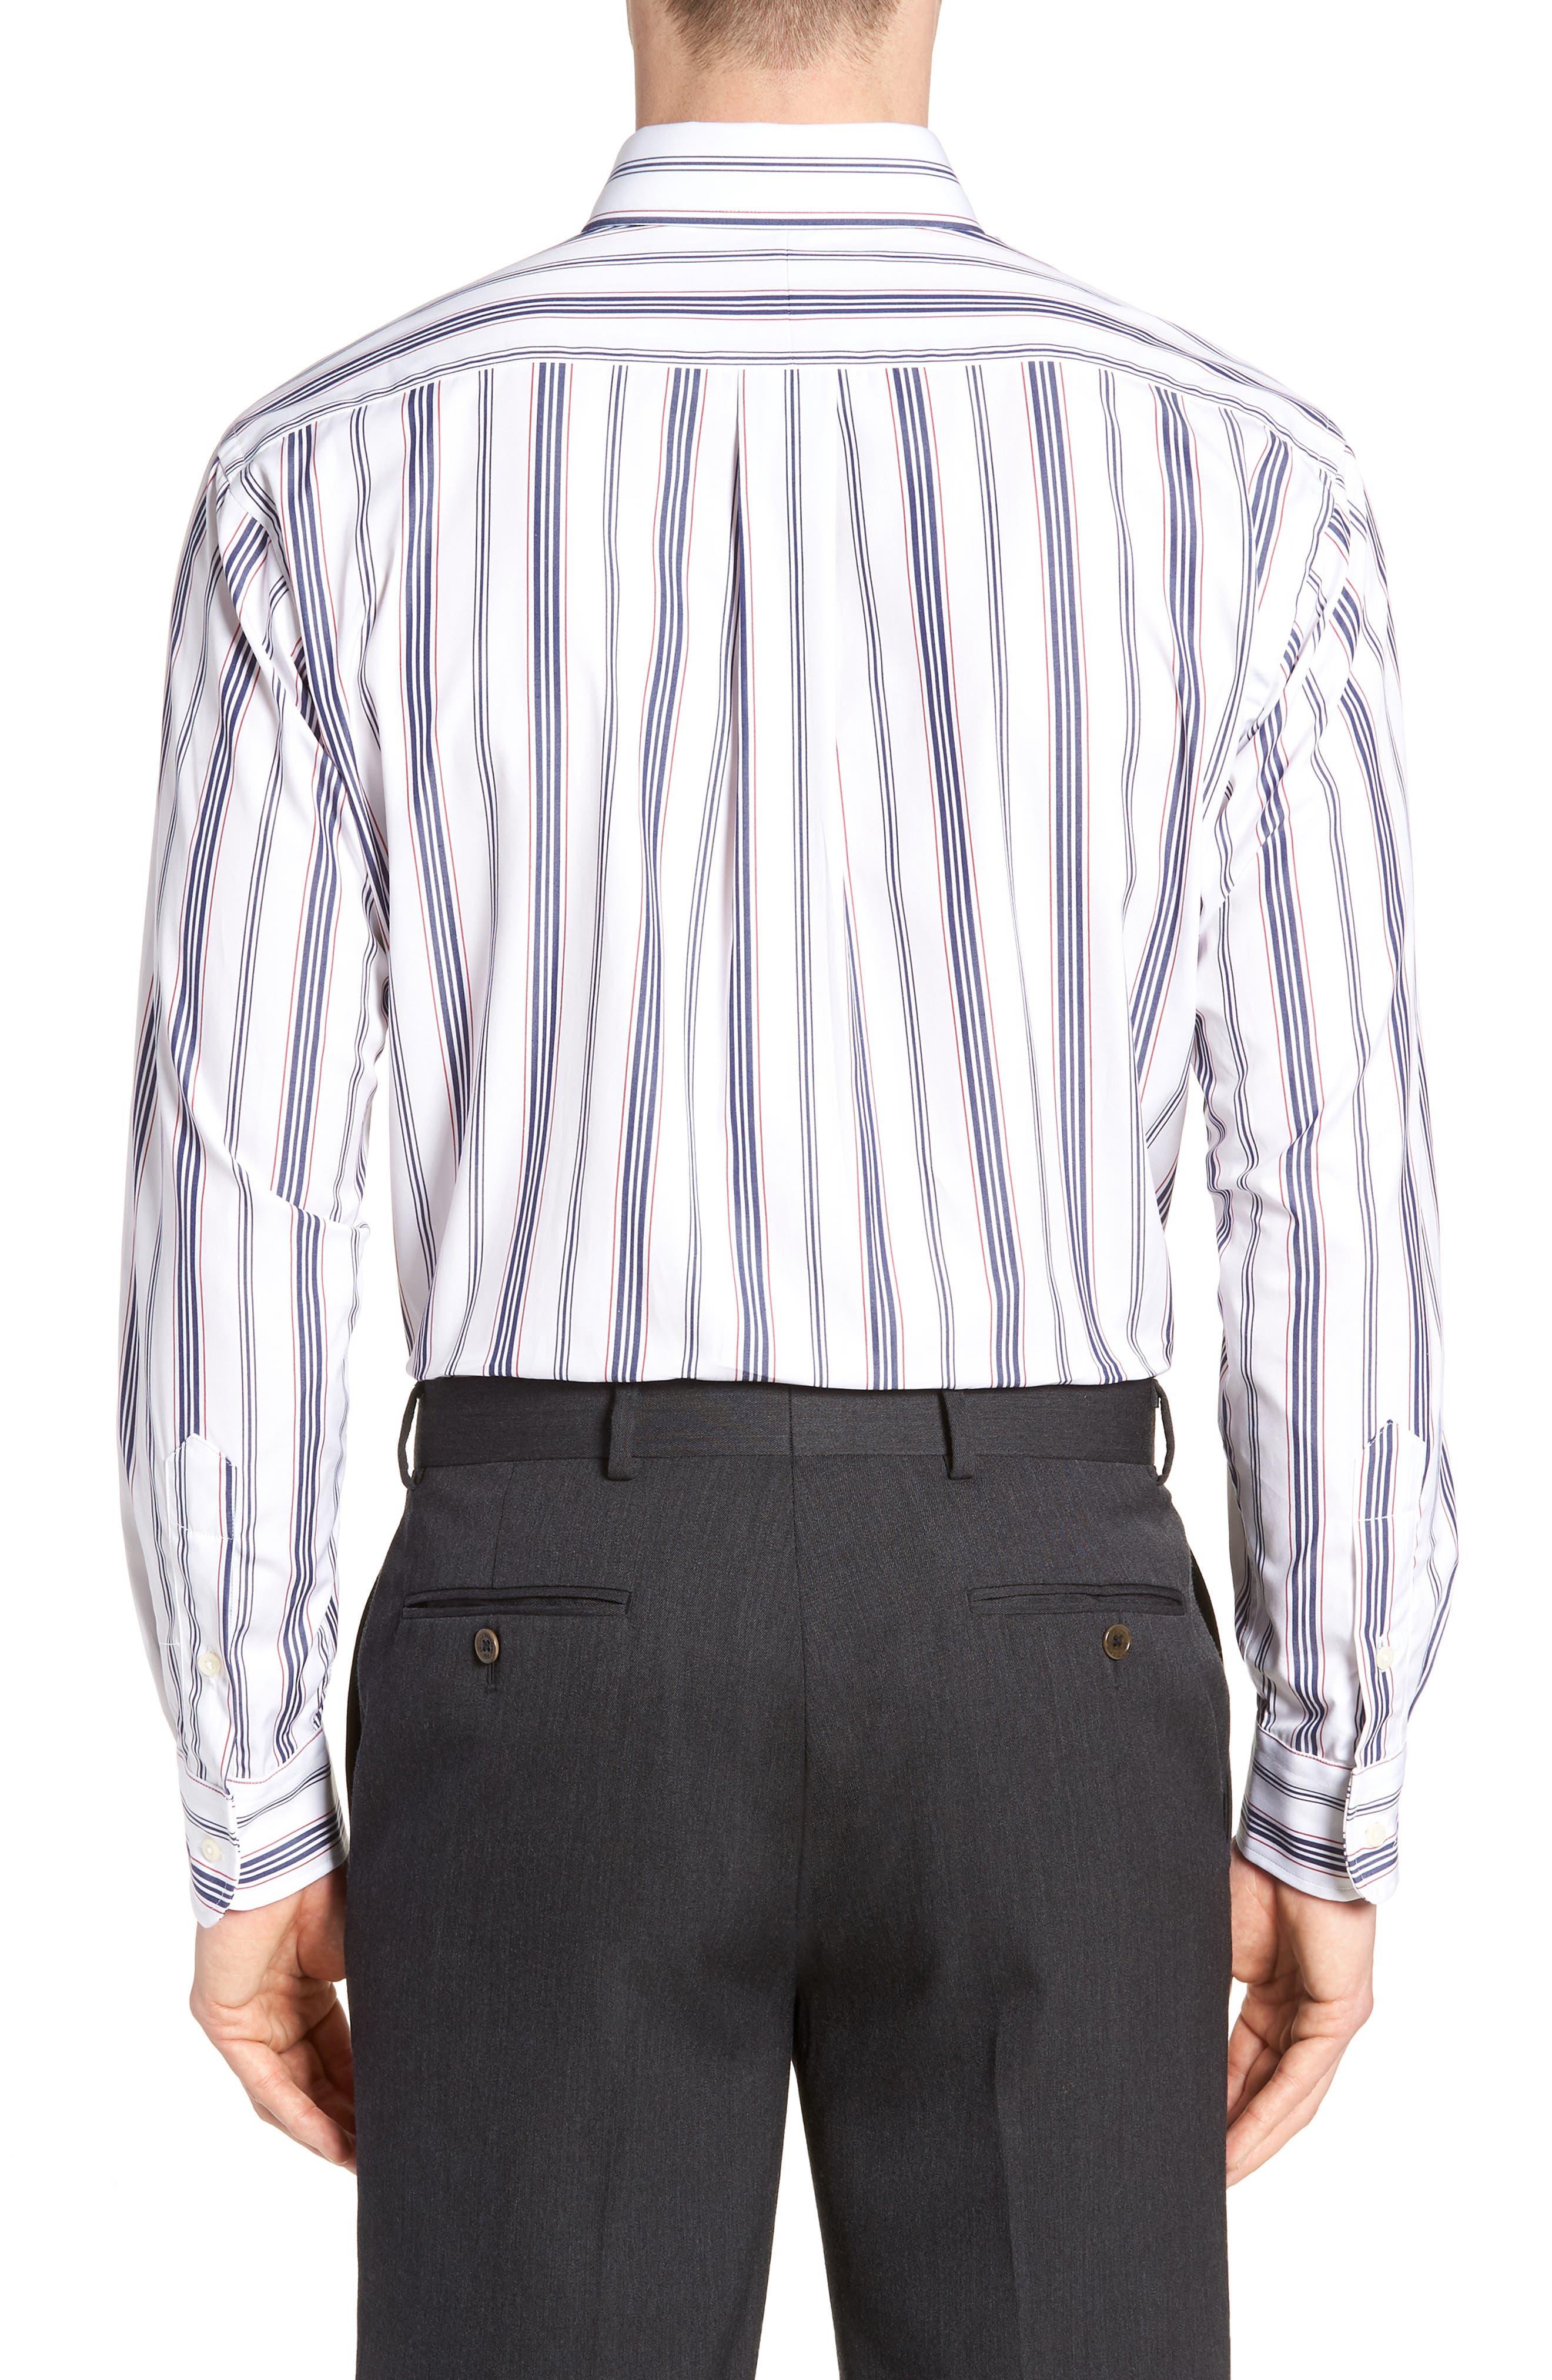 Tailored Fit Stripe Dress Shirt,                             Alternate thumbnail 3, color,                             WHITE/ BLUE